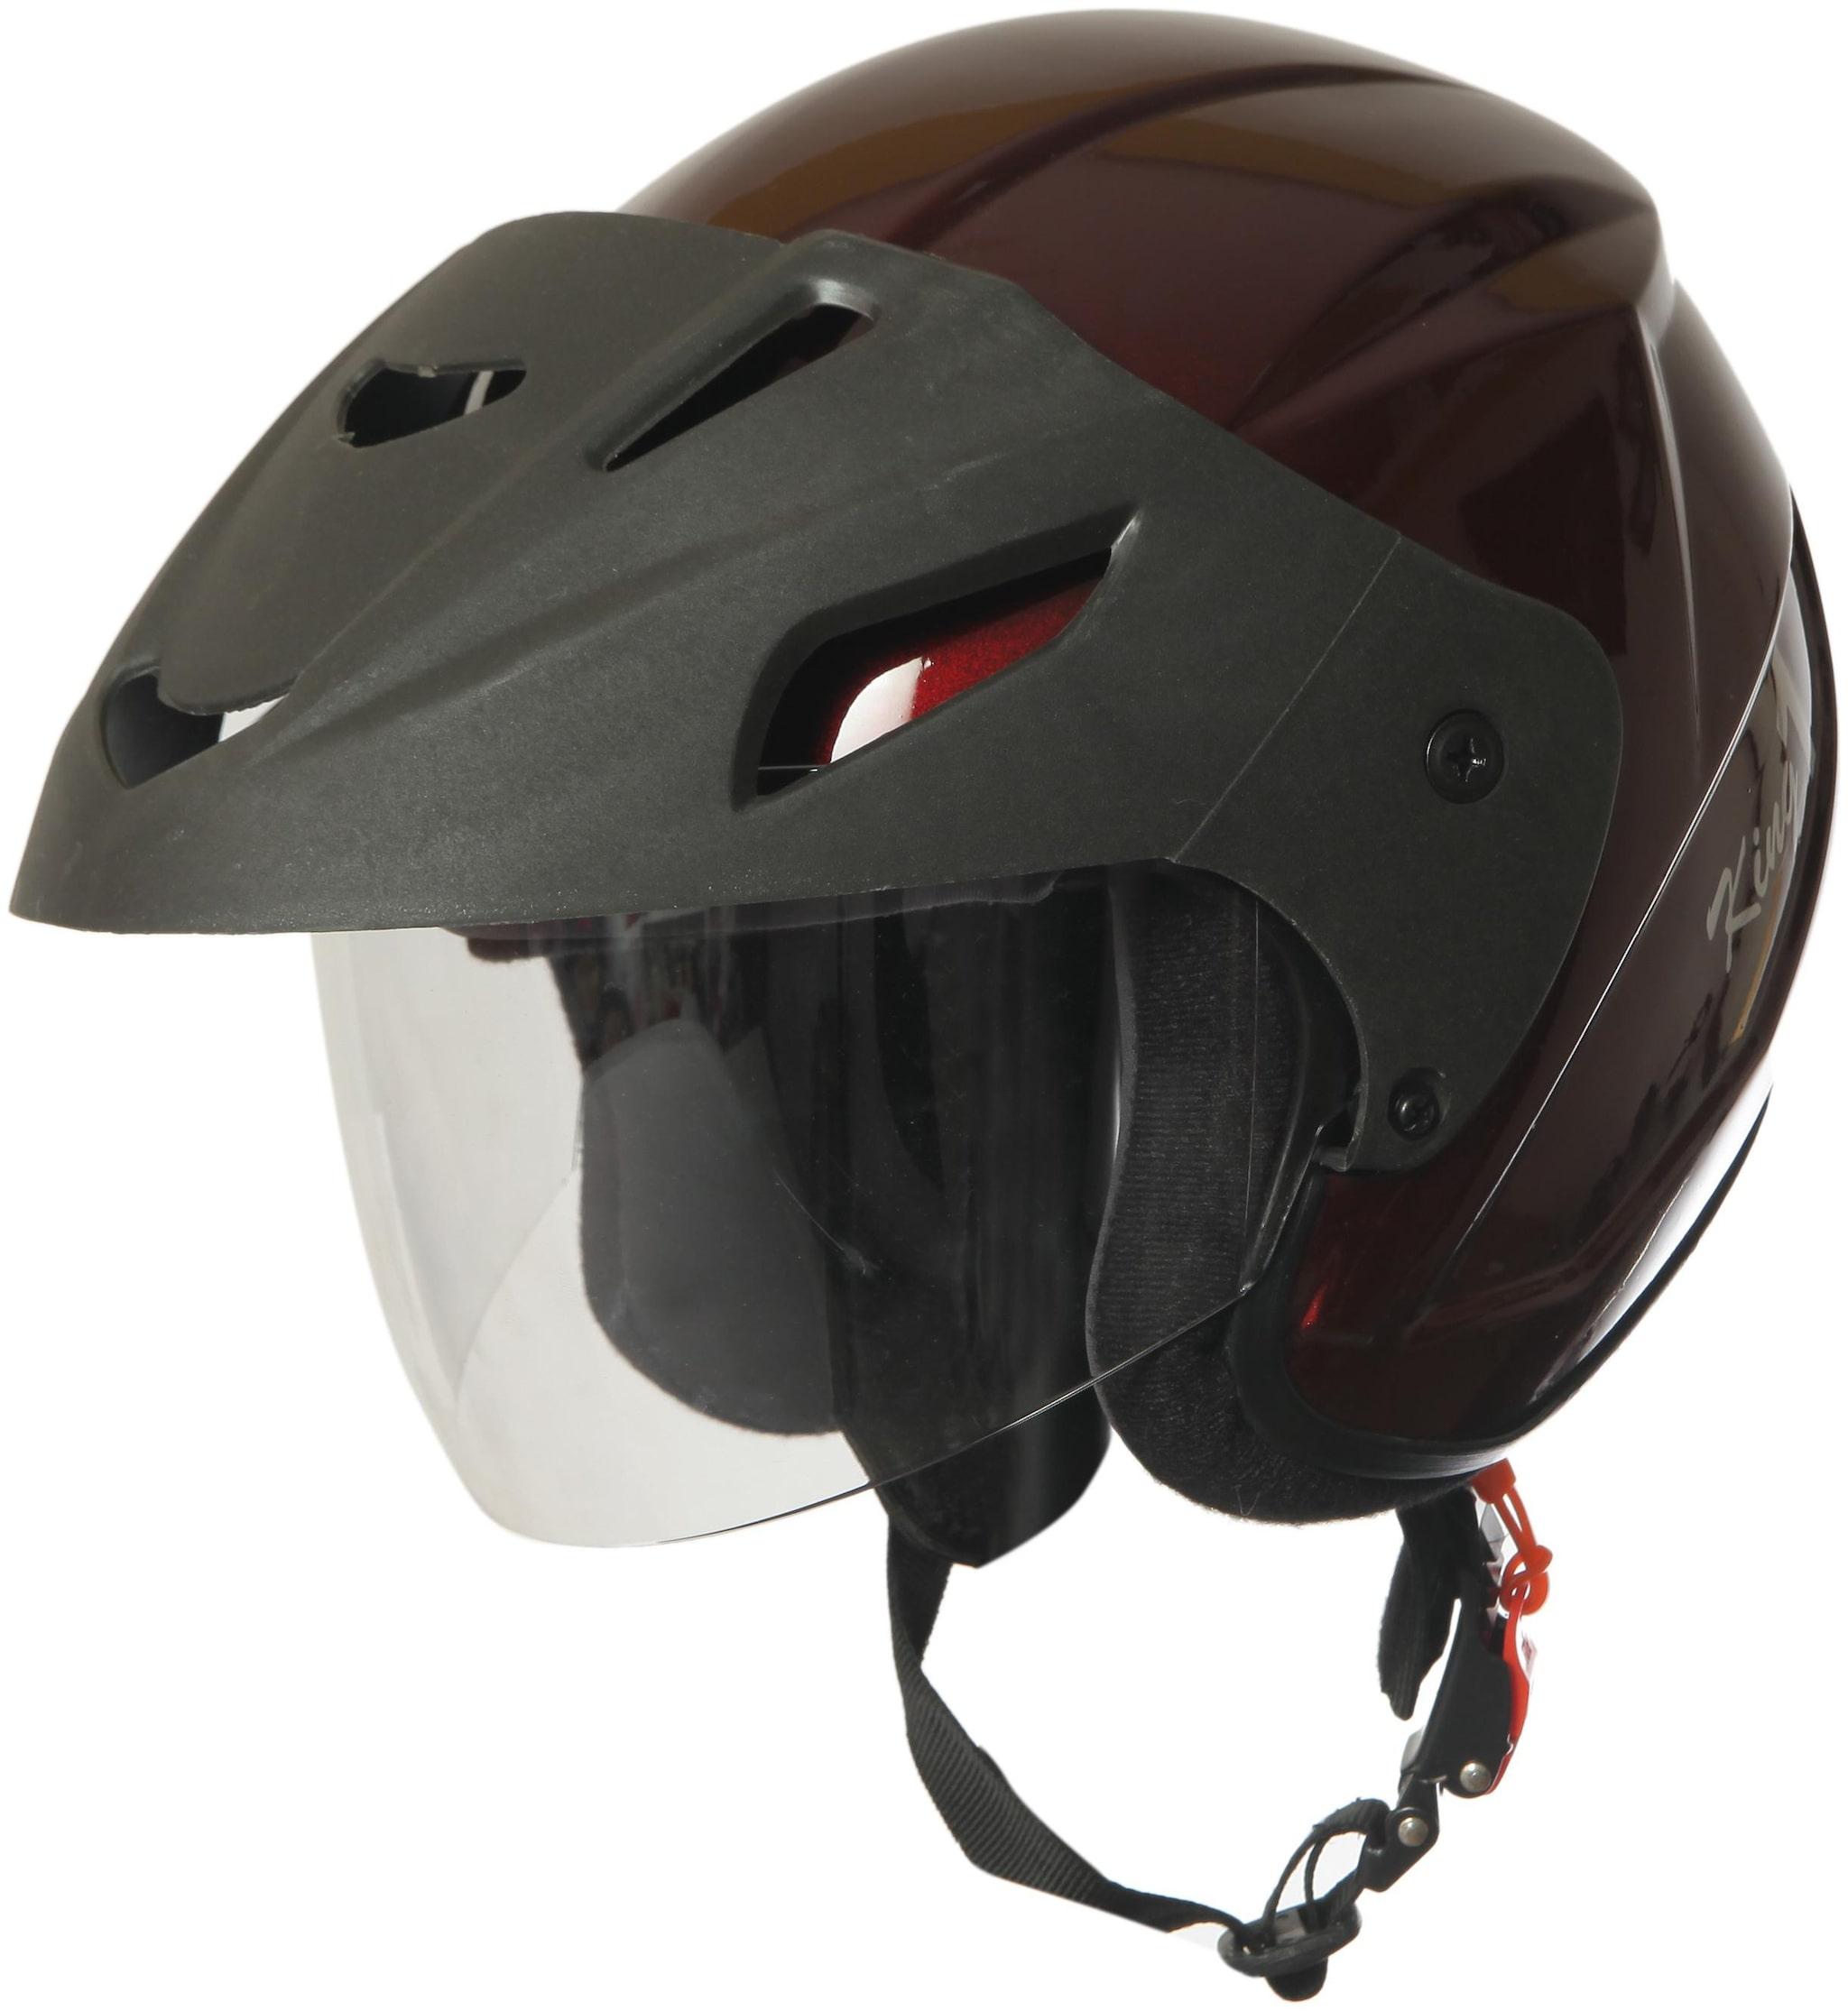 Rotomac Wine Red Open Face ISI Motorbike Helmet